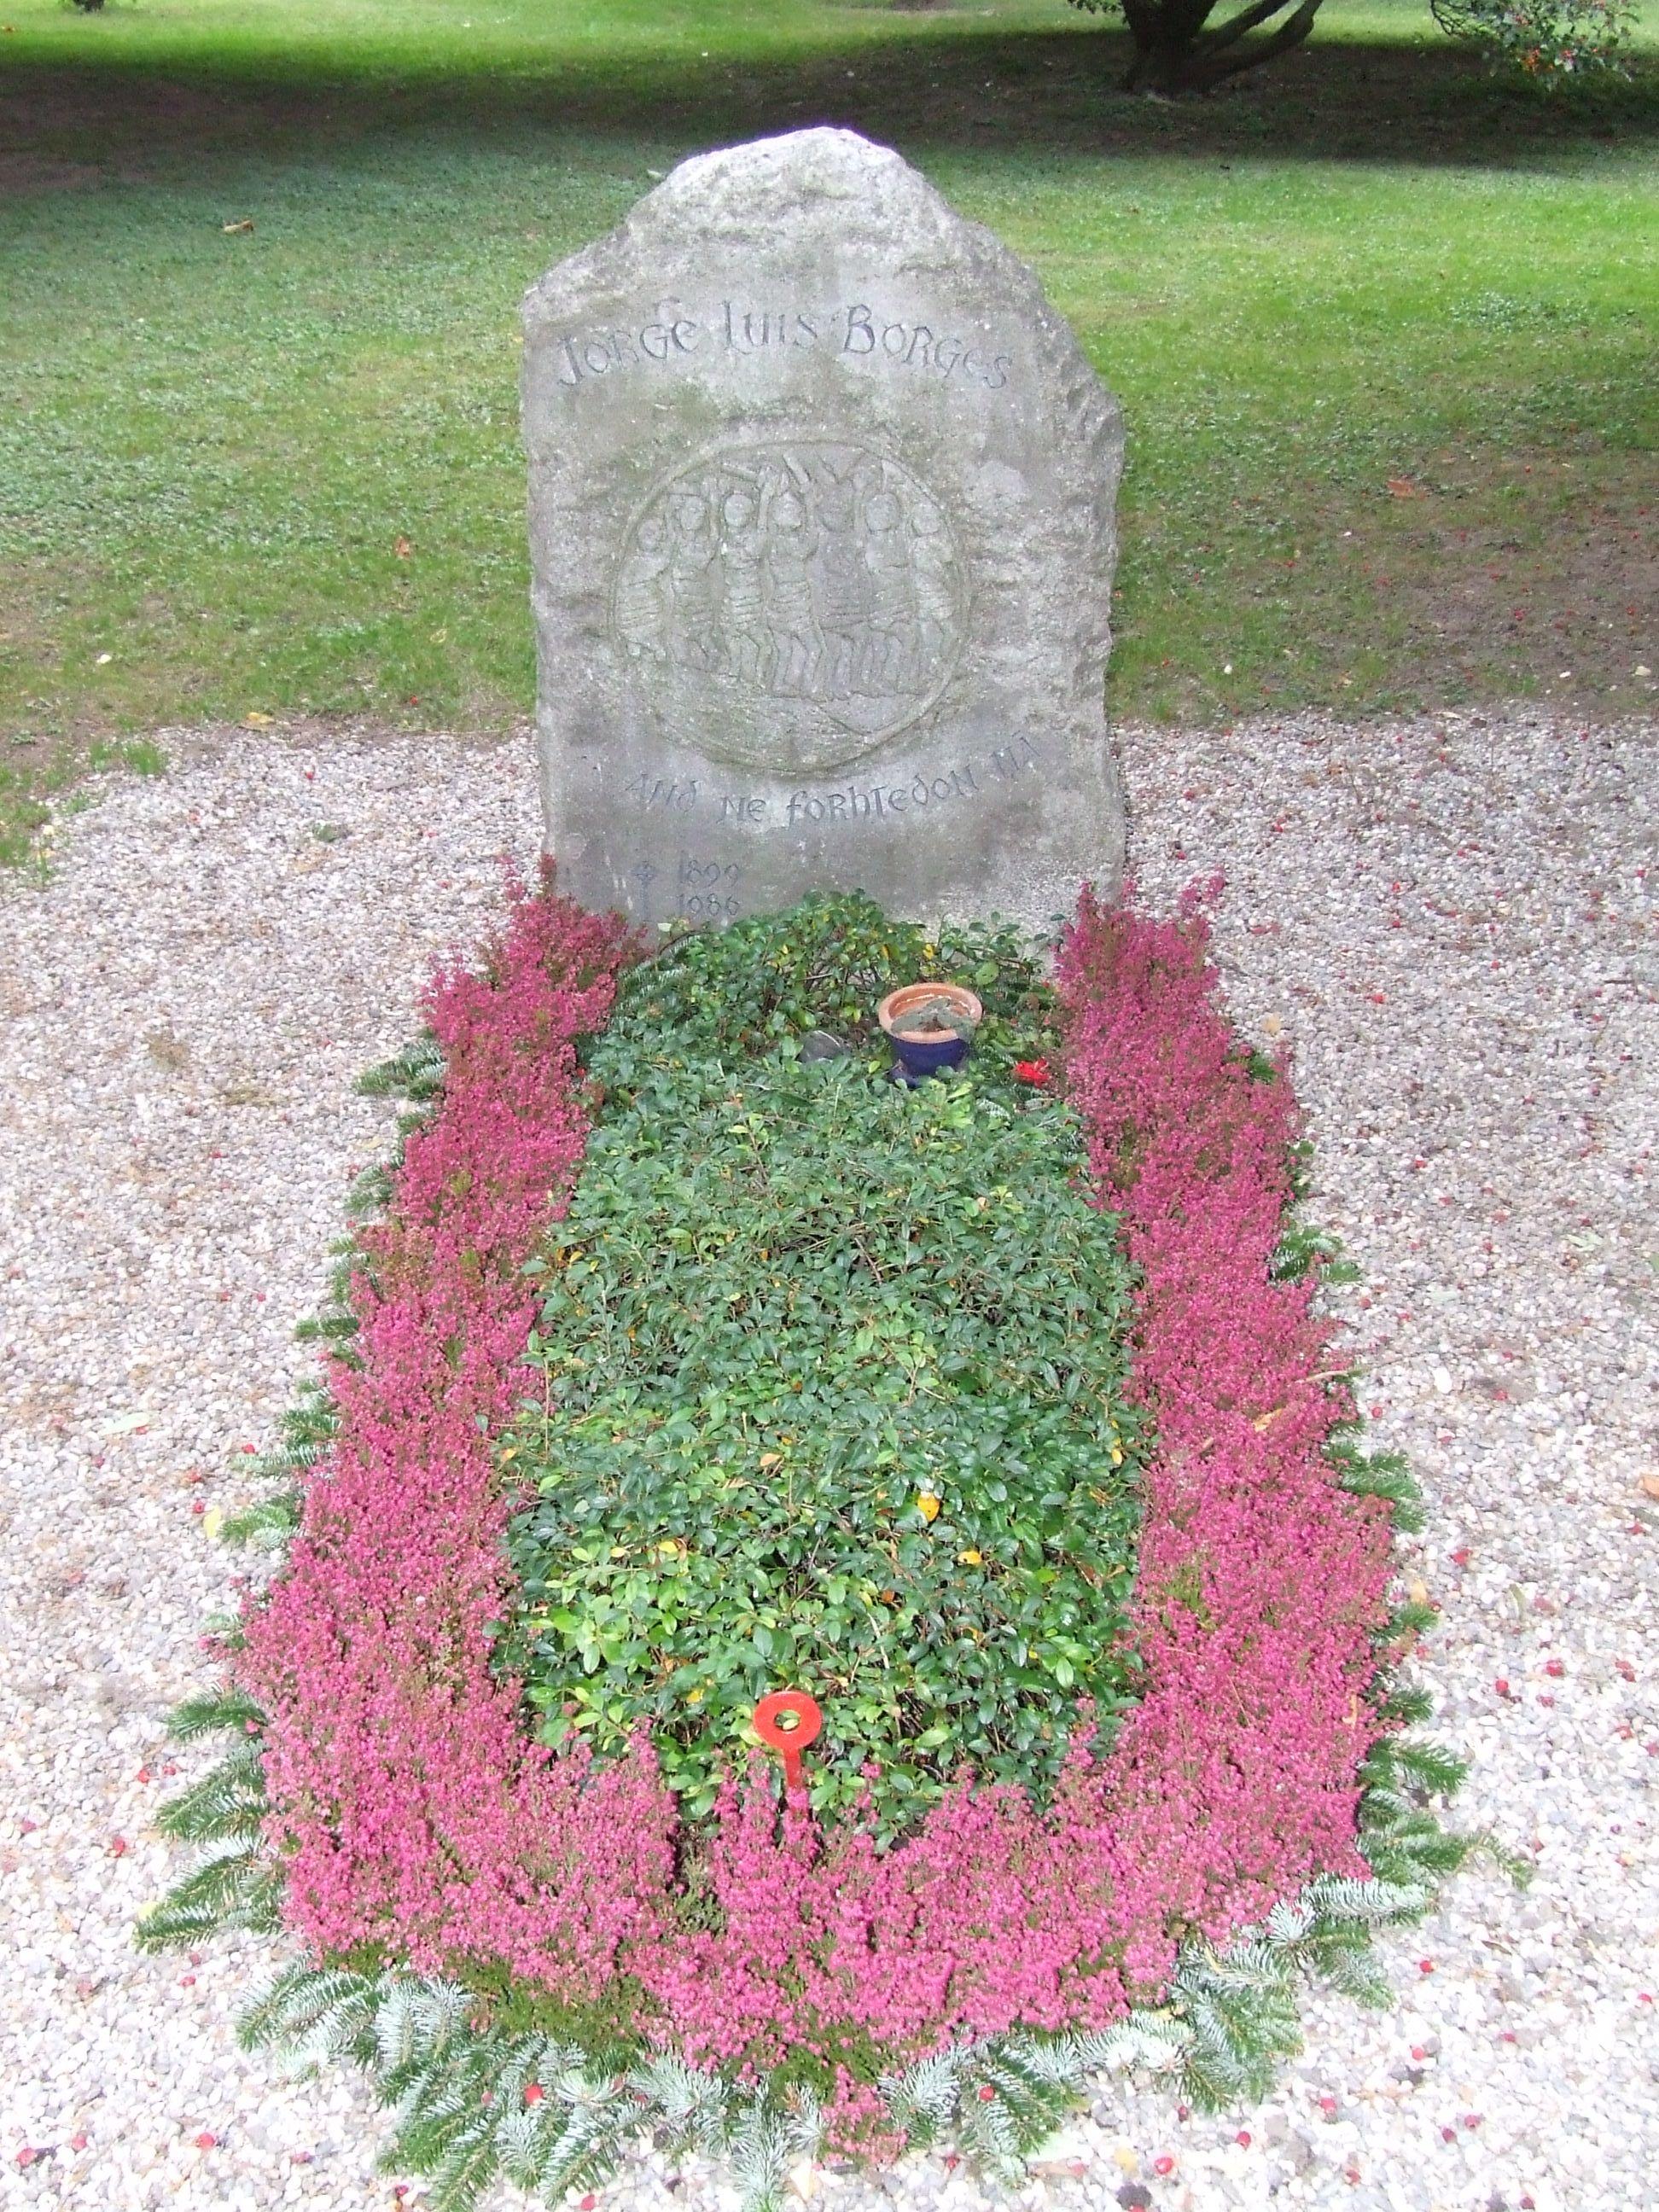 Tumba de Jorge Luis Borges en el cementerio de Plainpalais, en Ginebra.